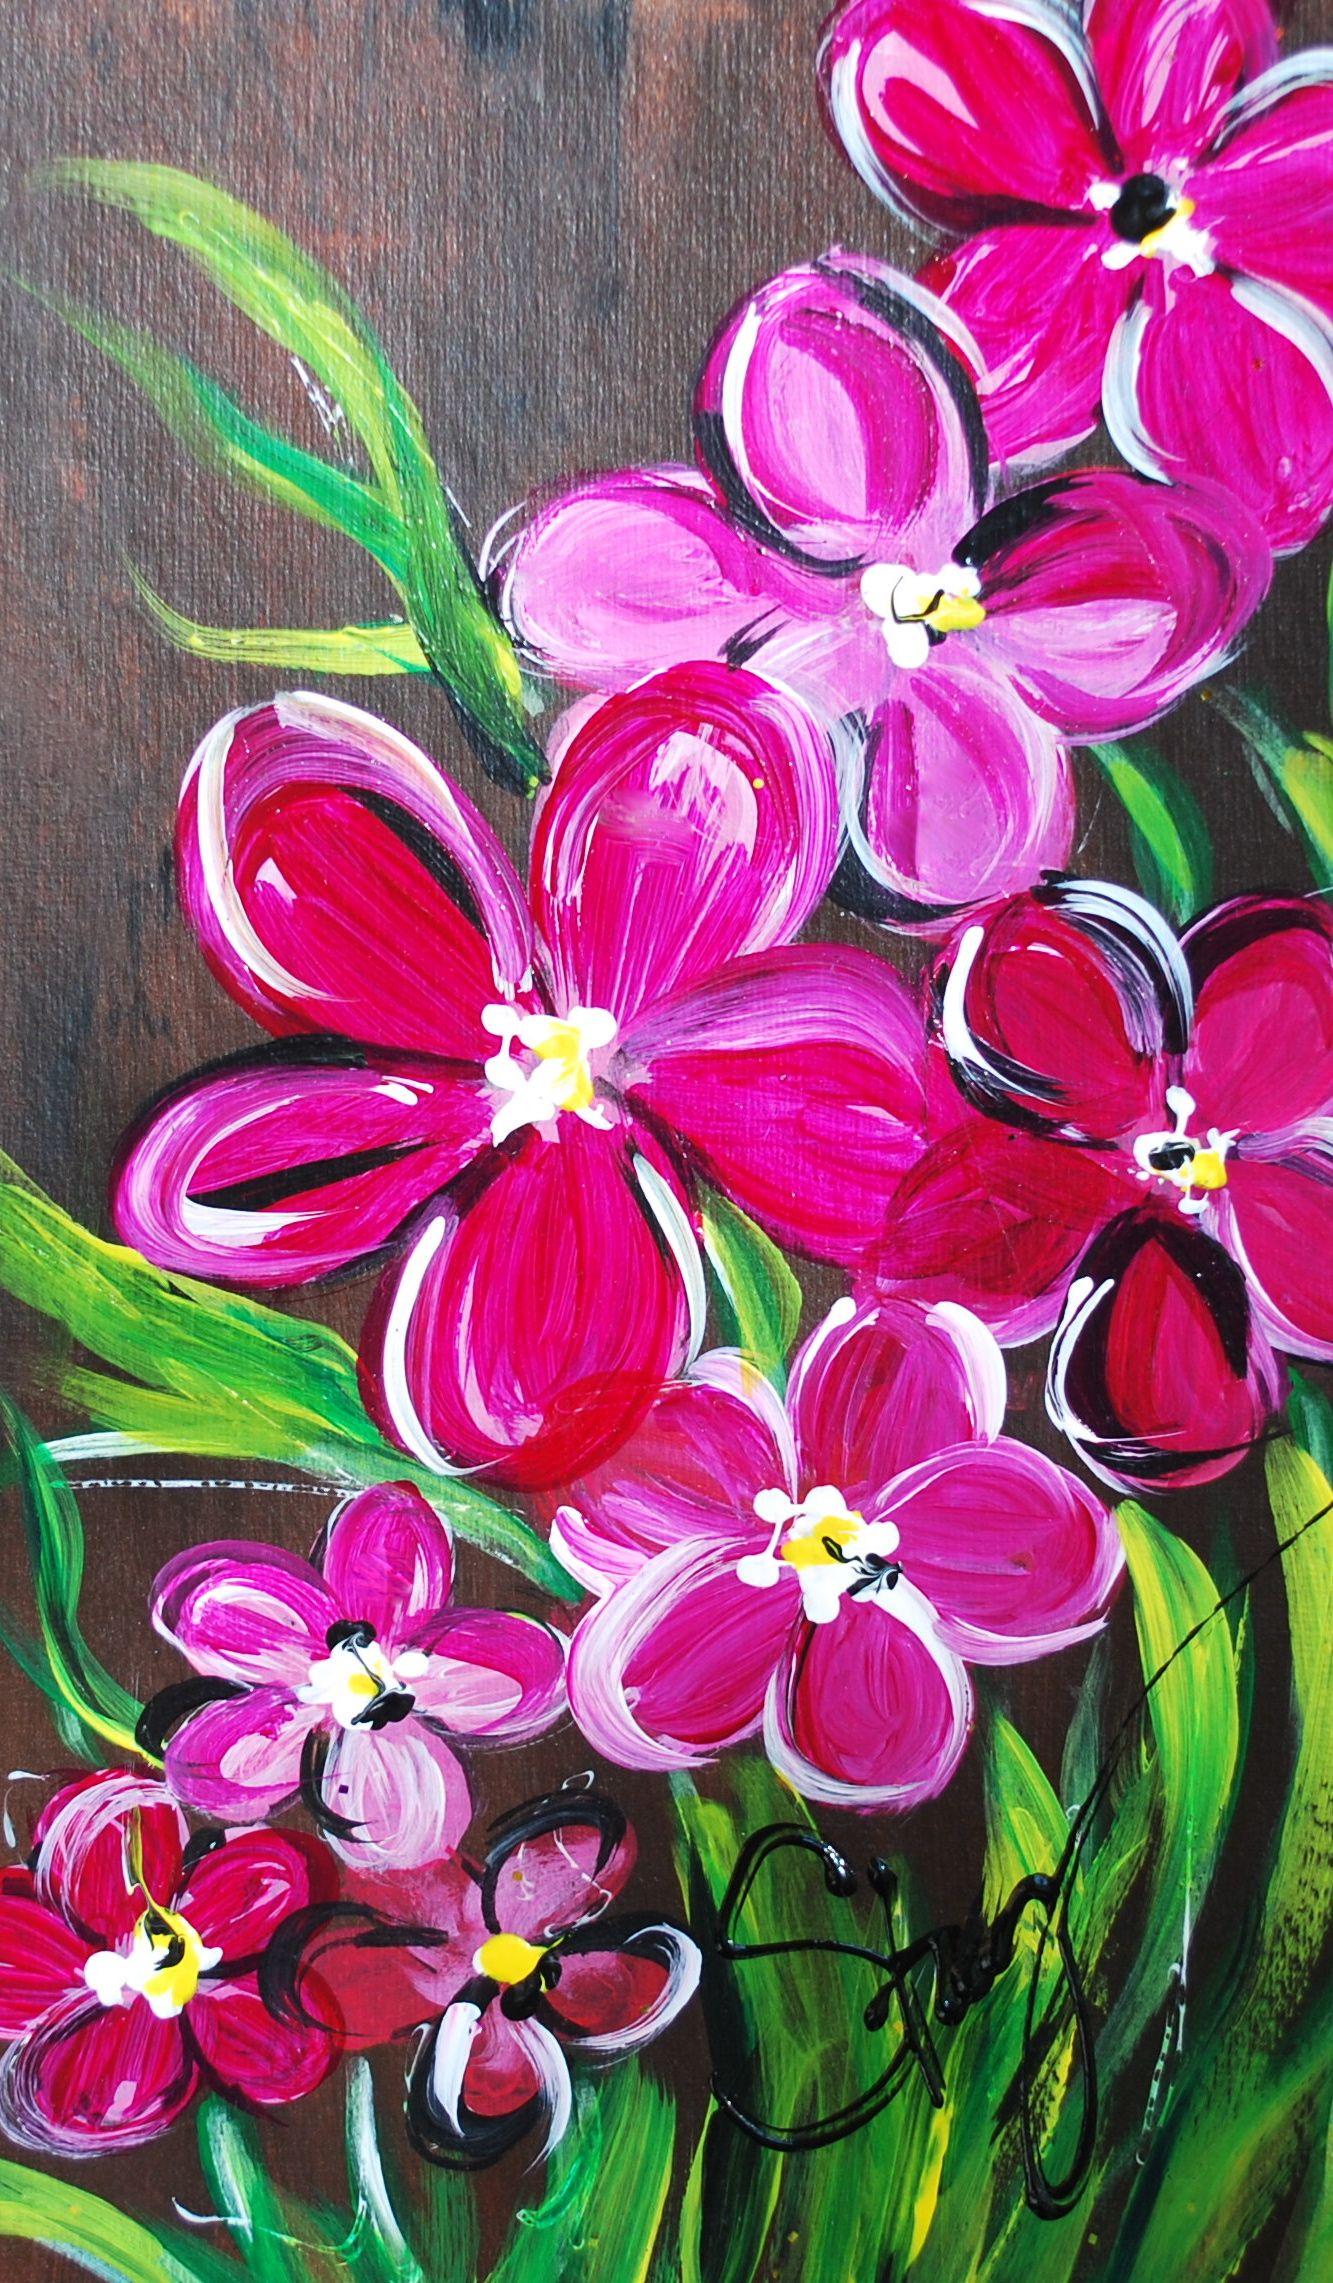 Flowers on 8x24 art painting canvas artwork flower art